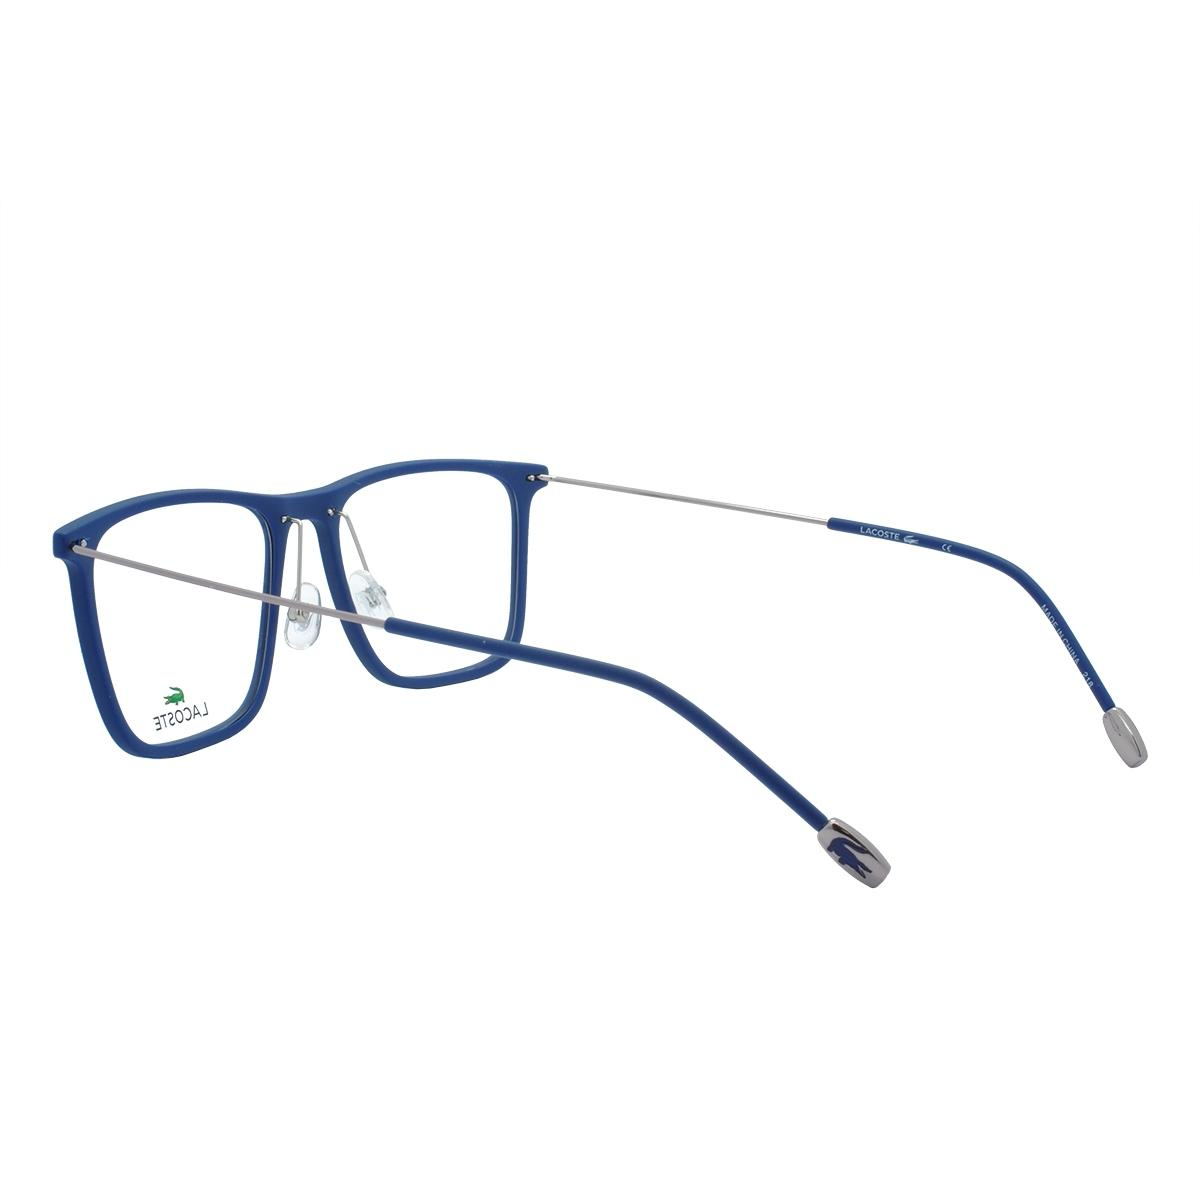 1a901502b Óculos de Grau Lacoste Masculino L2829 424 - Acetato Azul R$ 569,00 à  vista. Adicionar à sacola